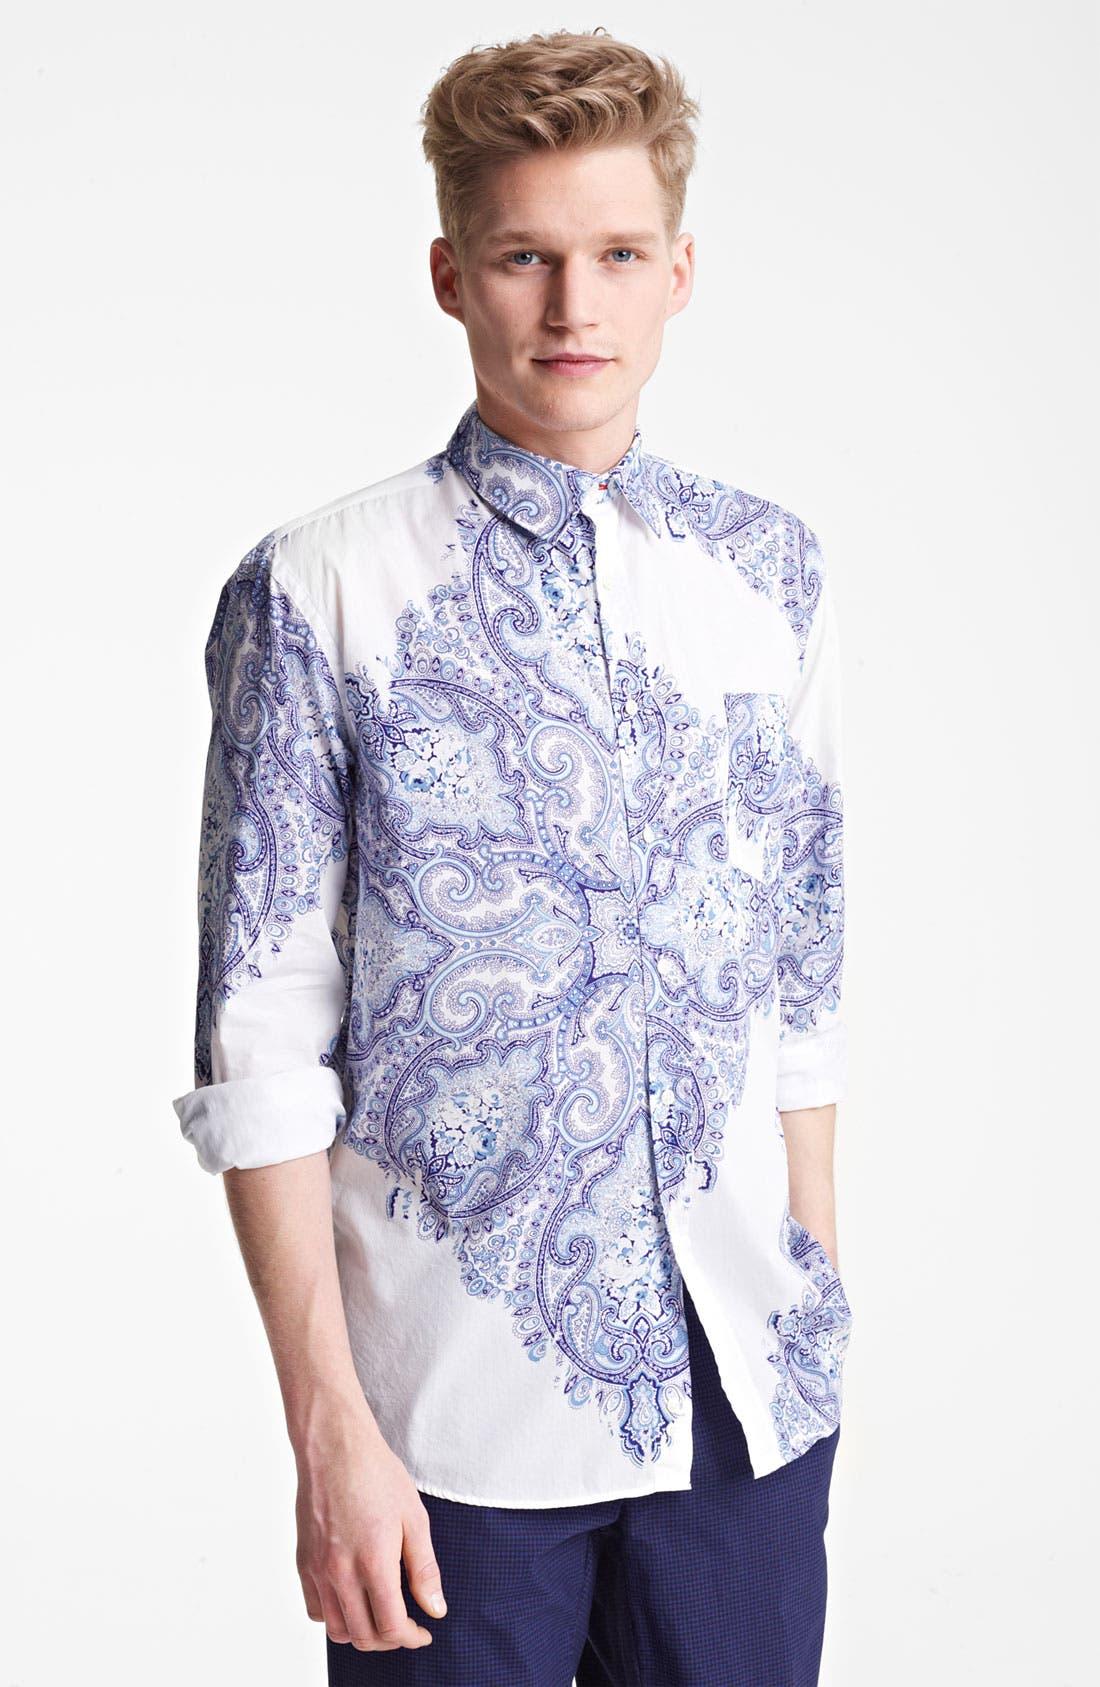 Alternate Image 1 Selected - Mason's Paisley Print Woven Shirt